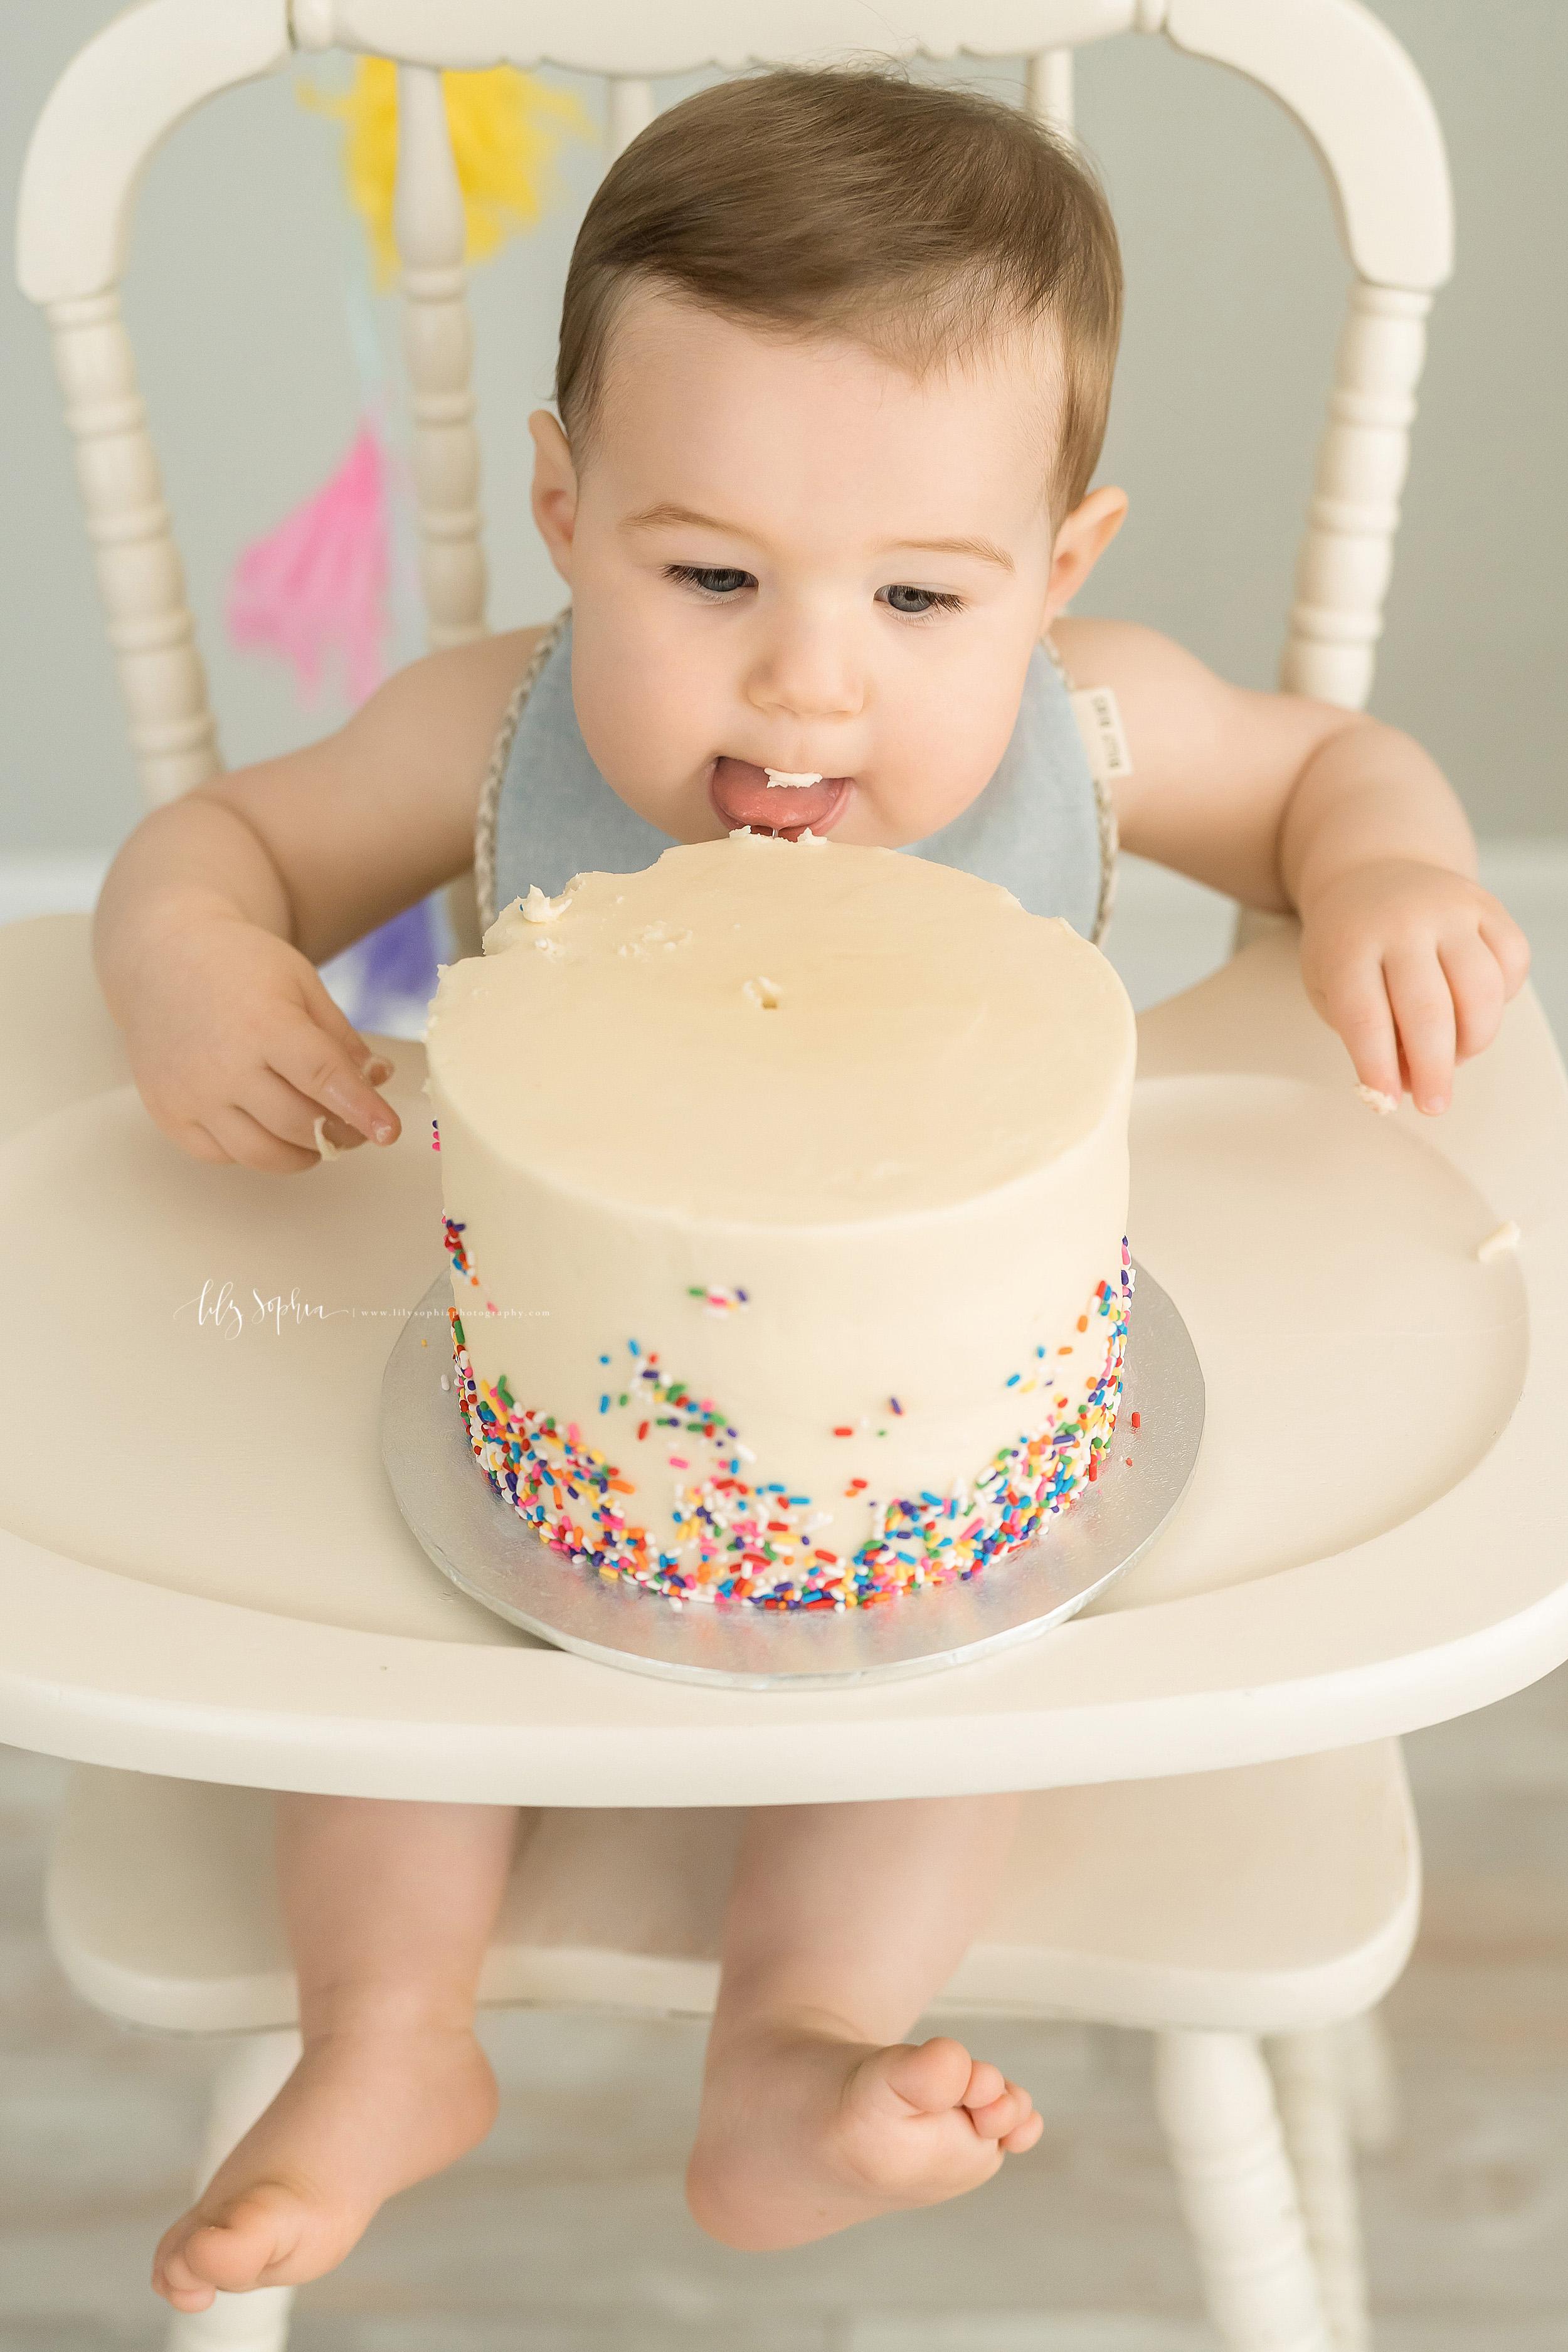 atlanta-decatur-candler-park-sandy-springs-buckhead-virginia-highlands-west-end-decatur-lily-sophia-photography-one-year-old-baby-boy-milestone-studio-family-photos-first-birthday-sprinkle-cake-smash_2215.jpg